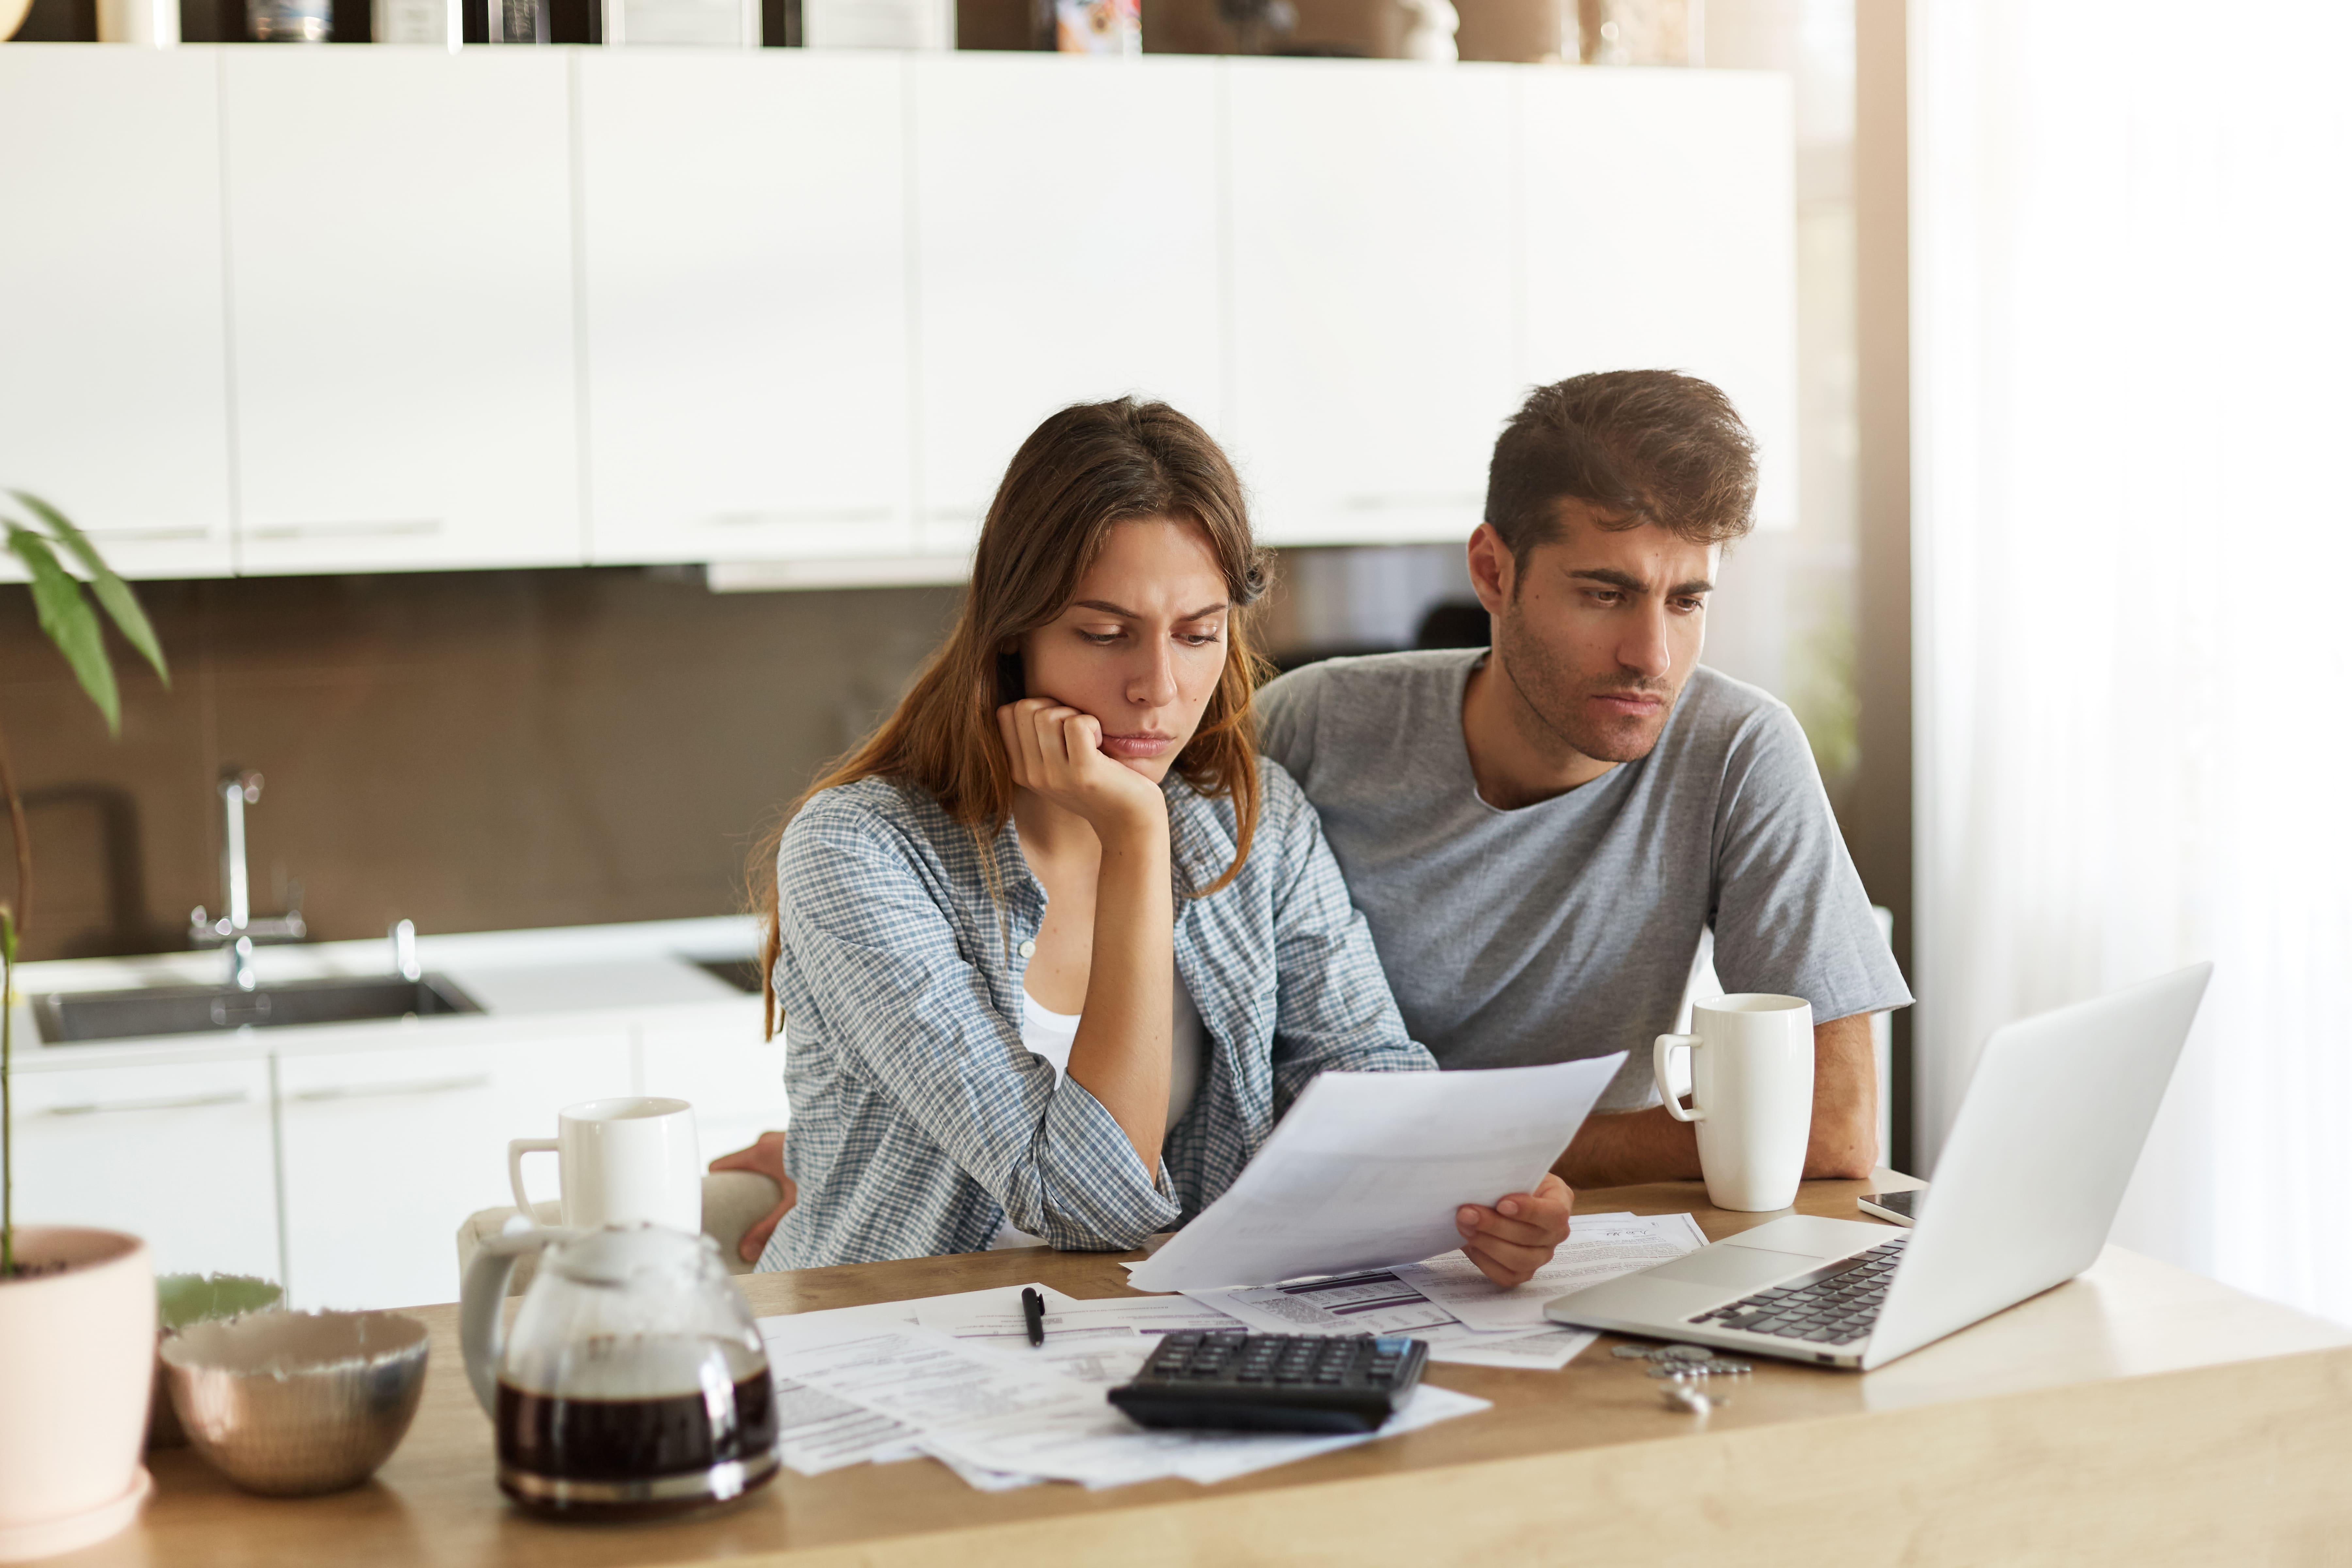 Préstamo para reunificar deudas: ¿es recomendable?